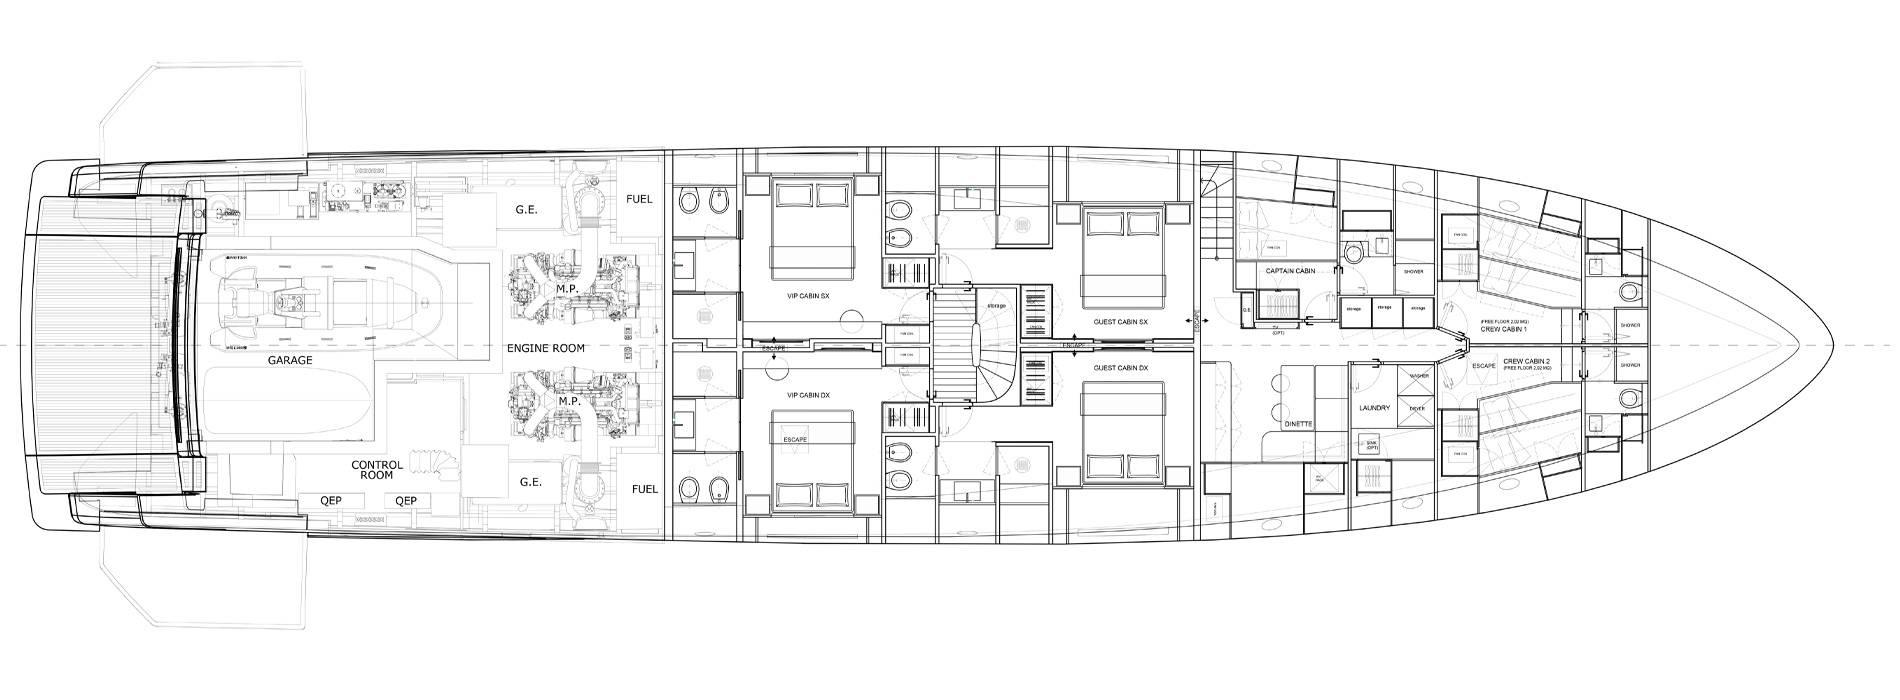 Sanlorenzo Yachts SD118 Lower deck